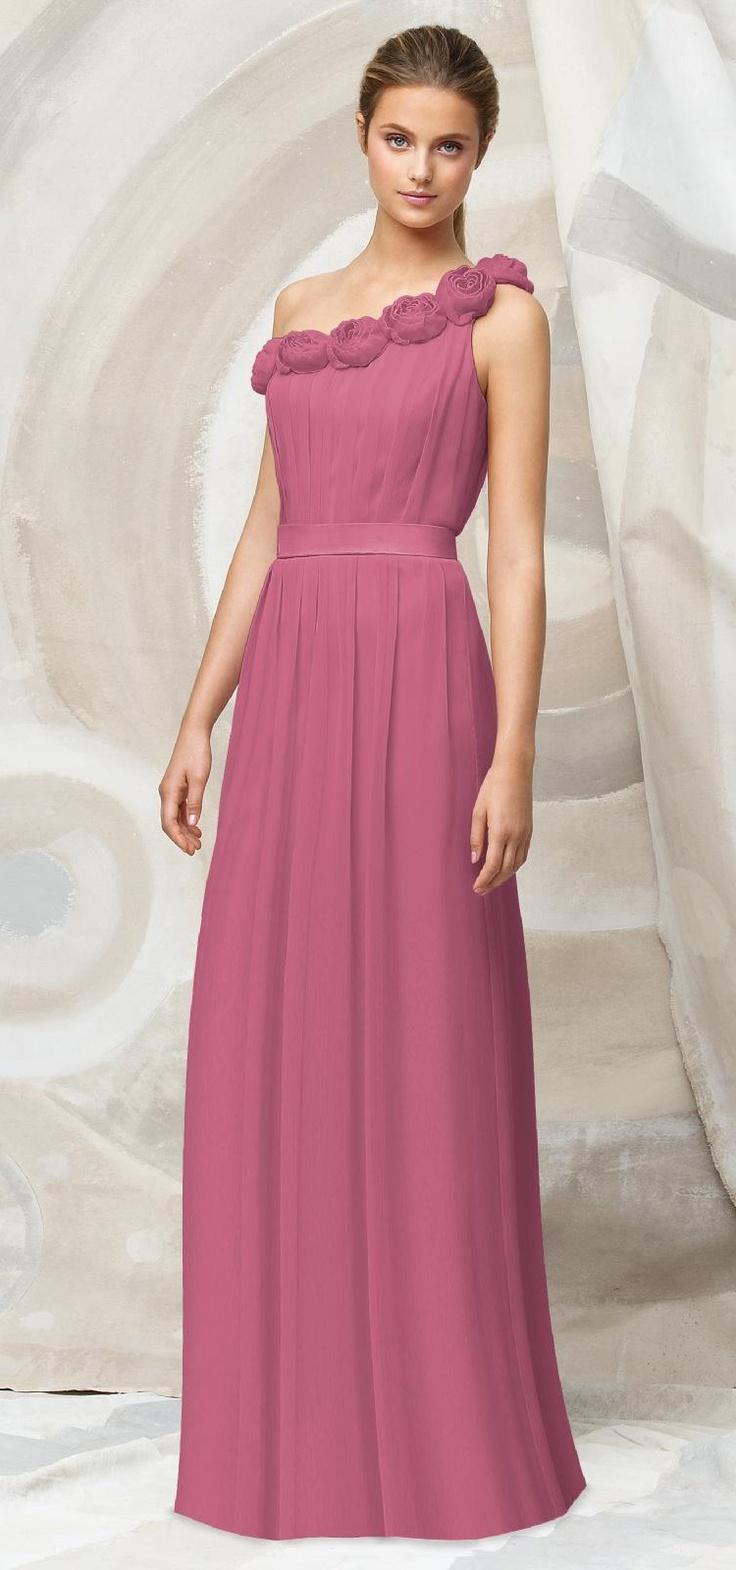 97 best Bridesmaid images on Pinterest | Bridesmaids, Ballroom dress ...